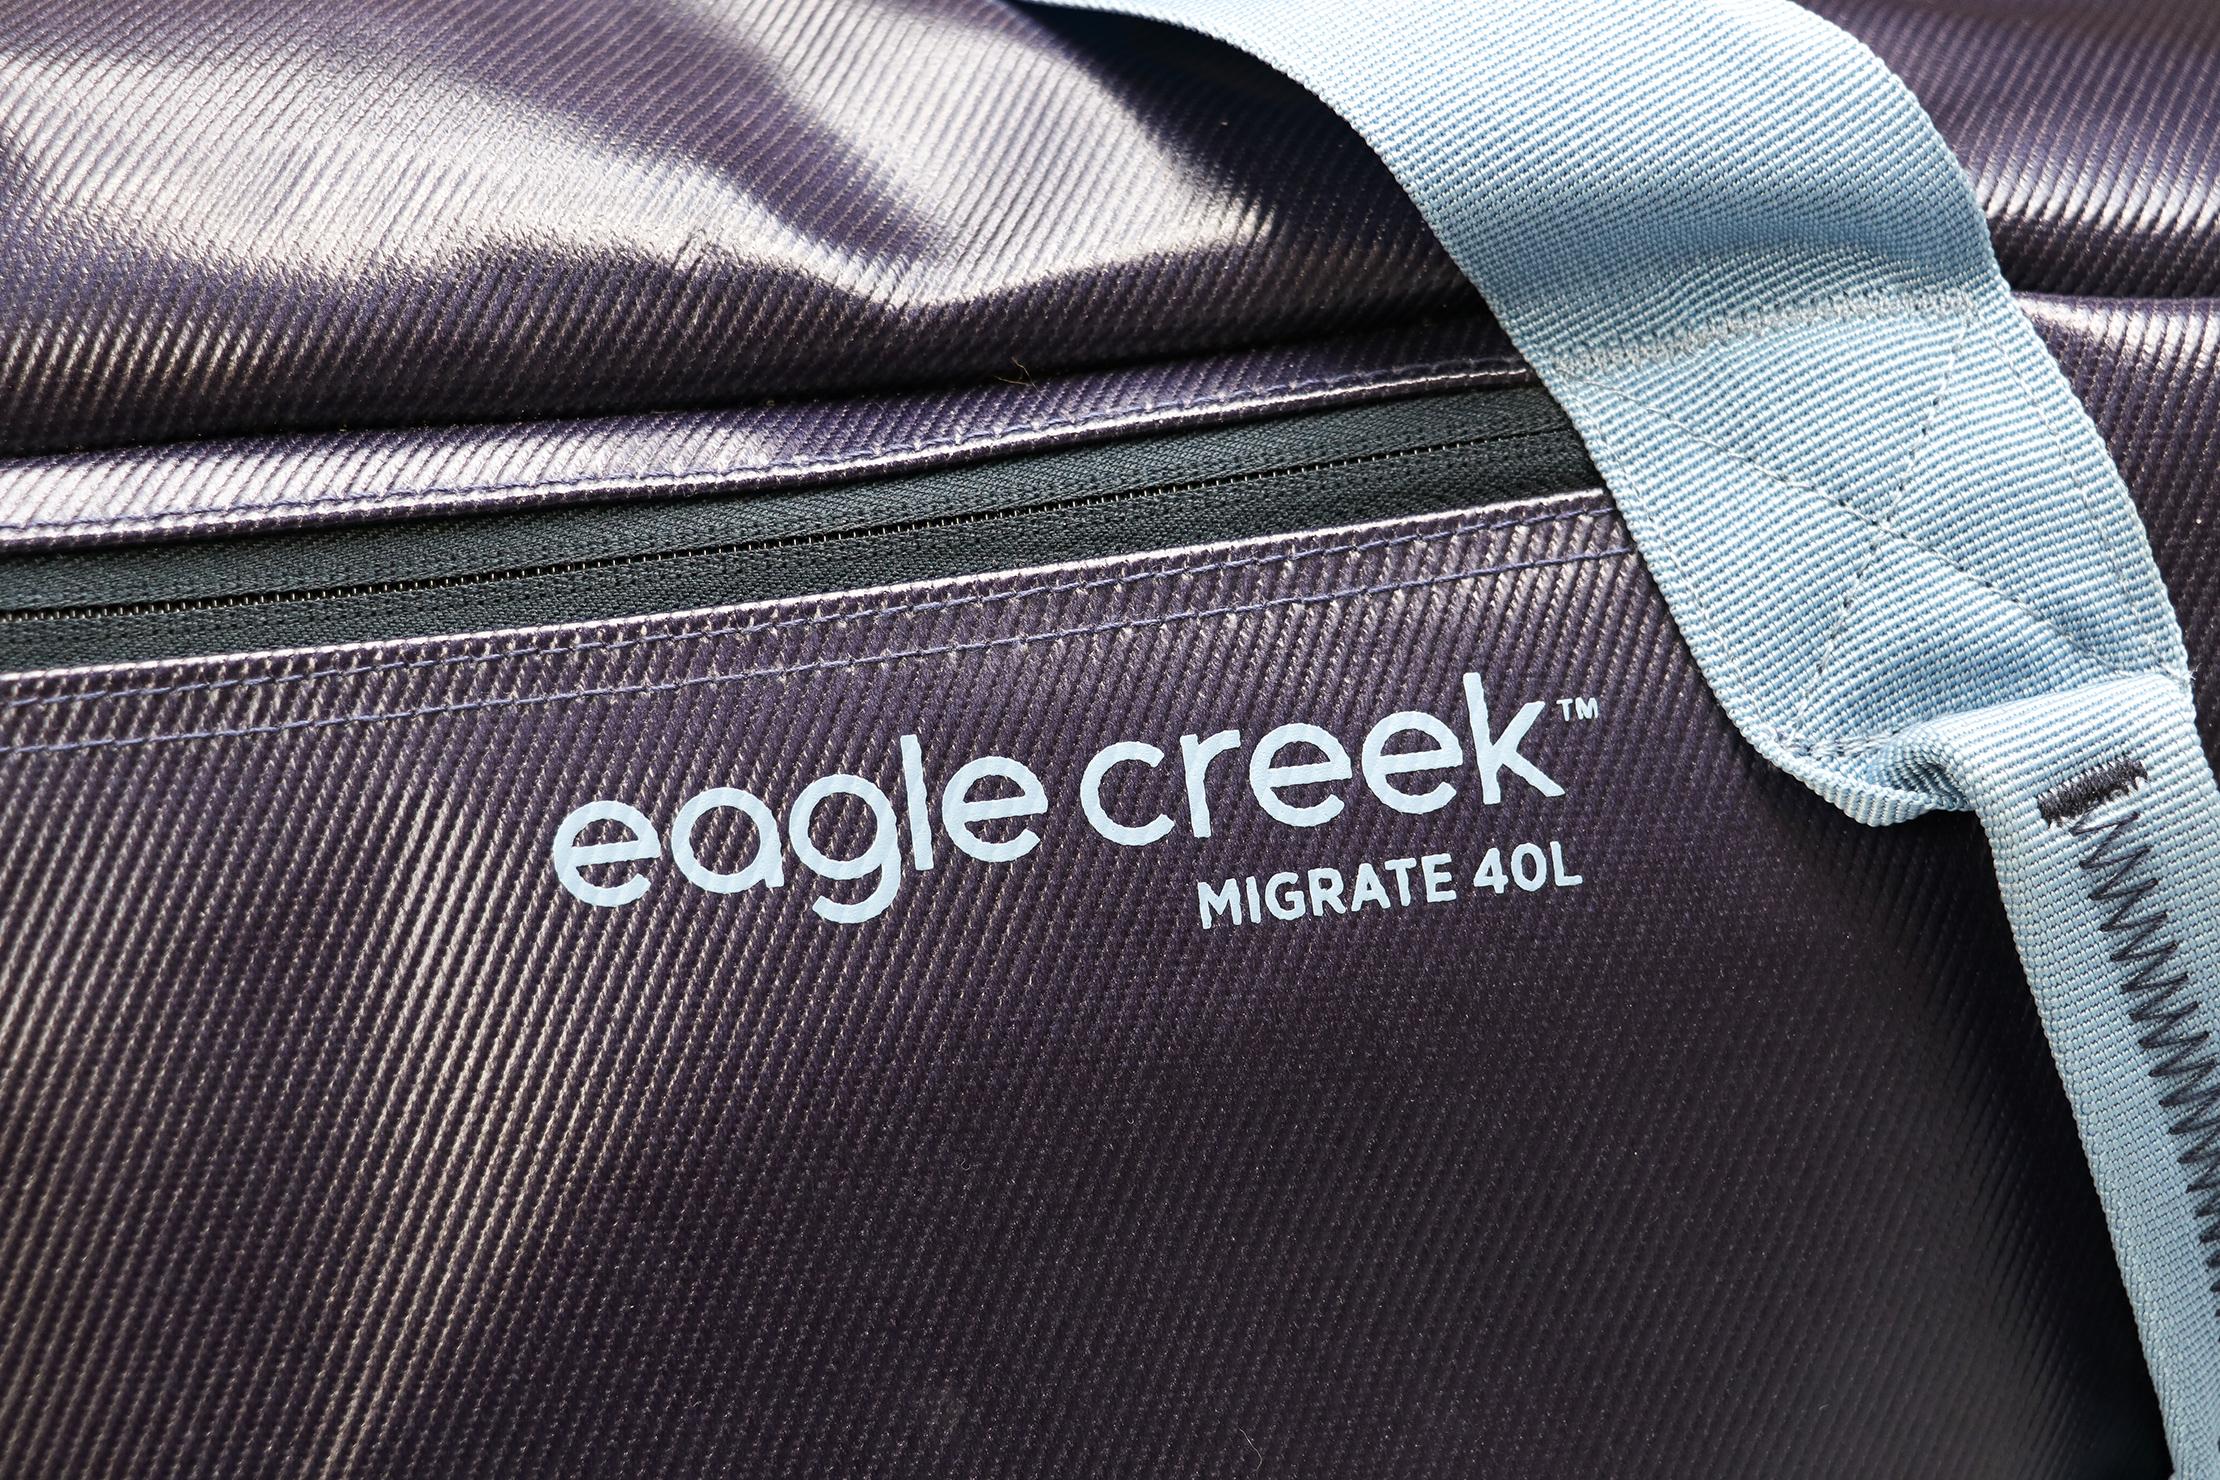 Eagle Creek Migrate Duffel 40L Top Material and Logo